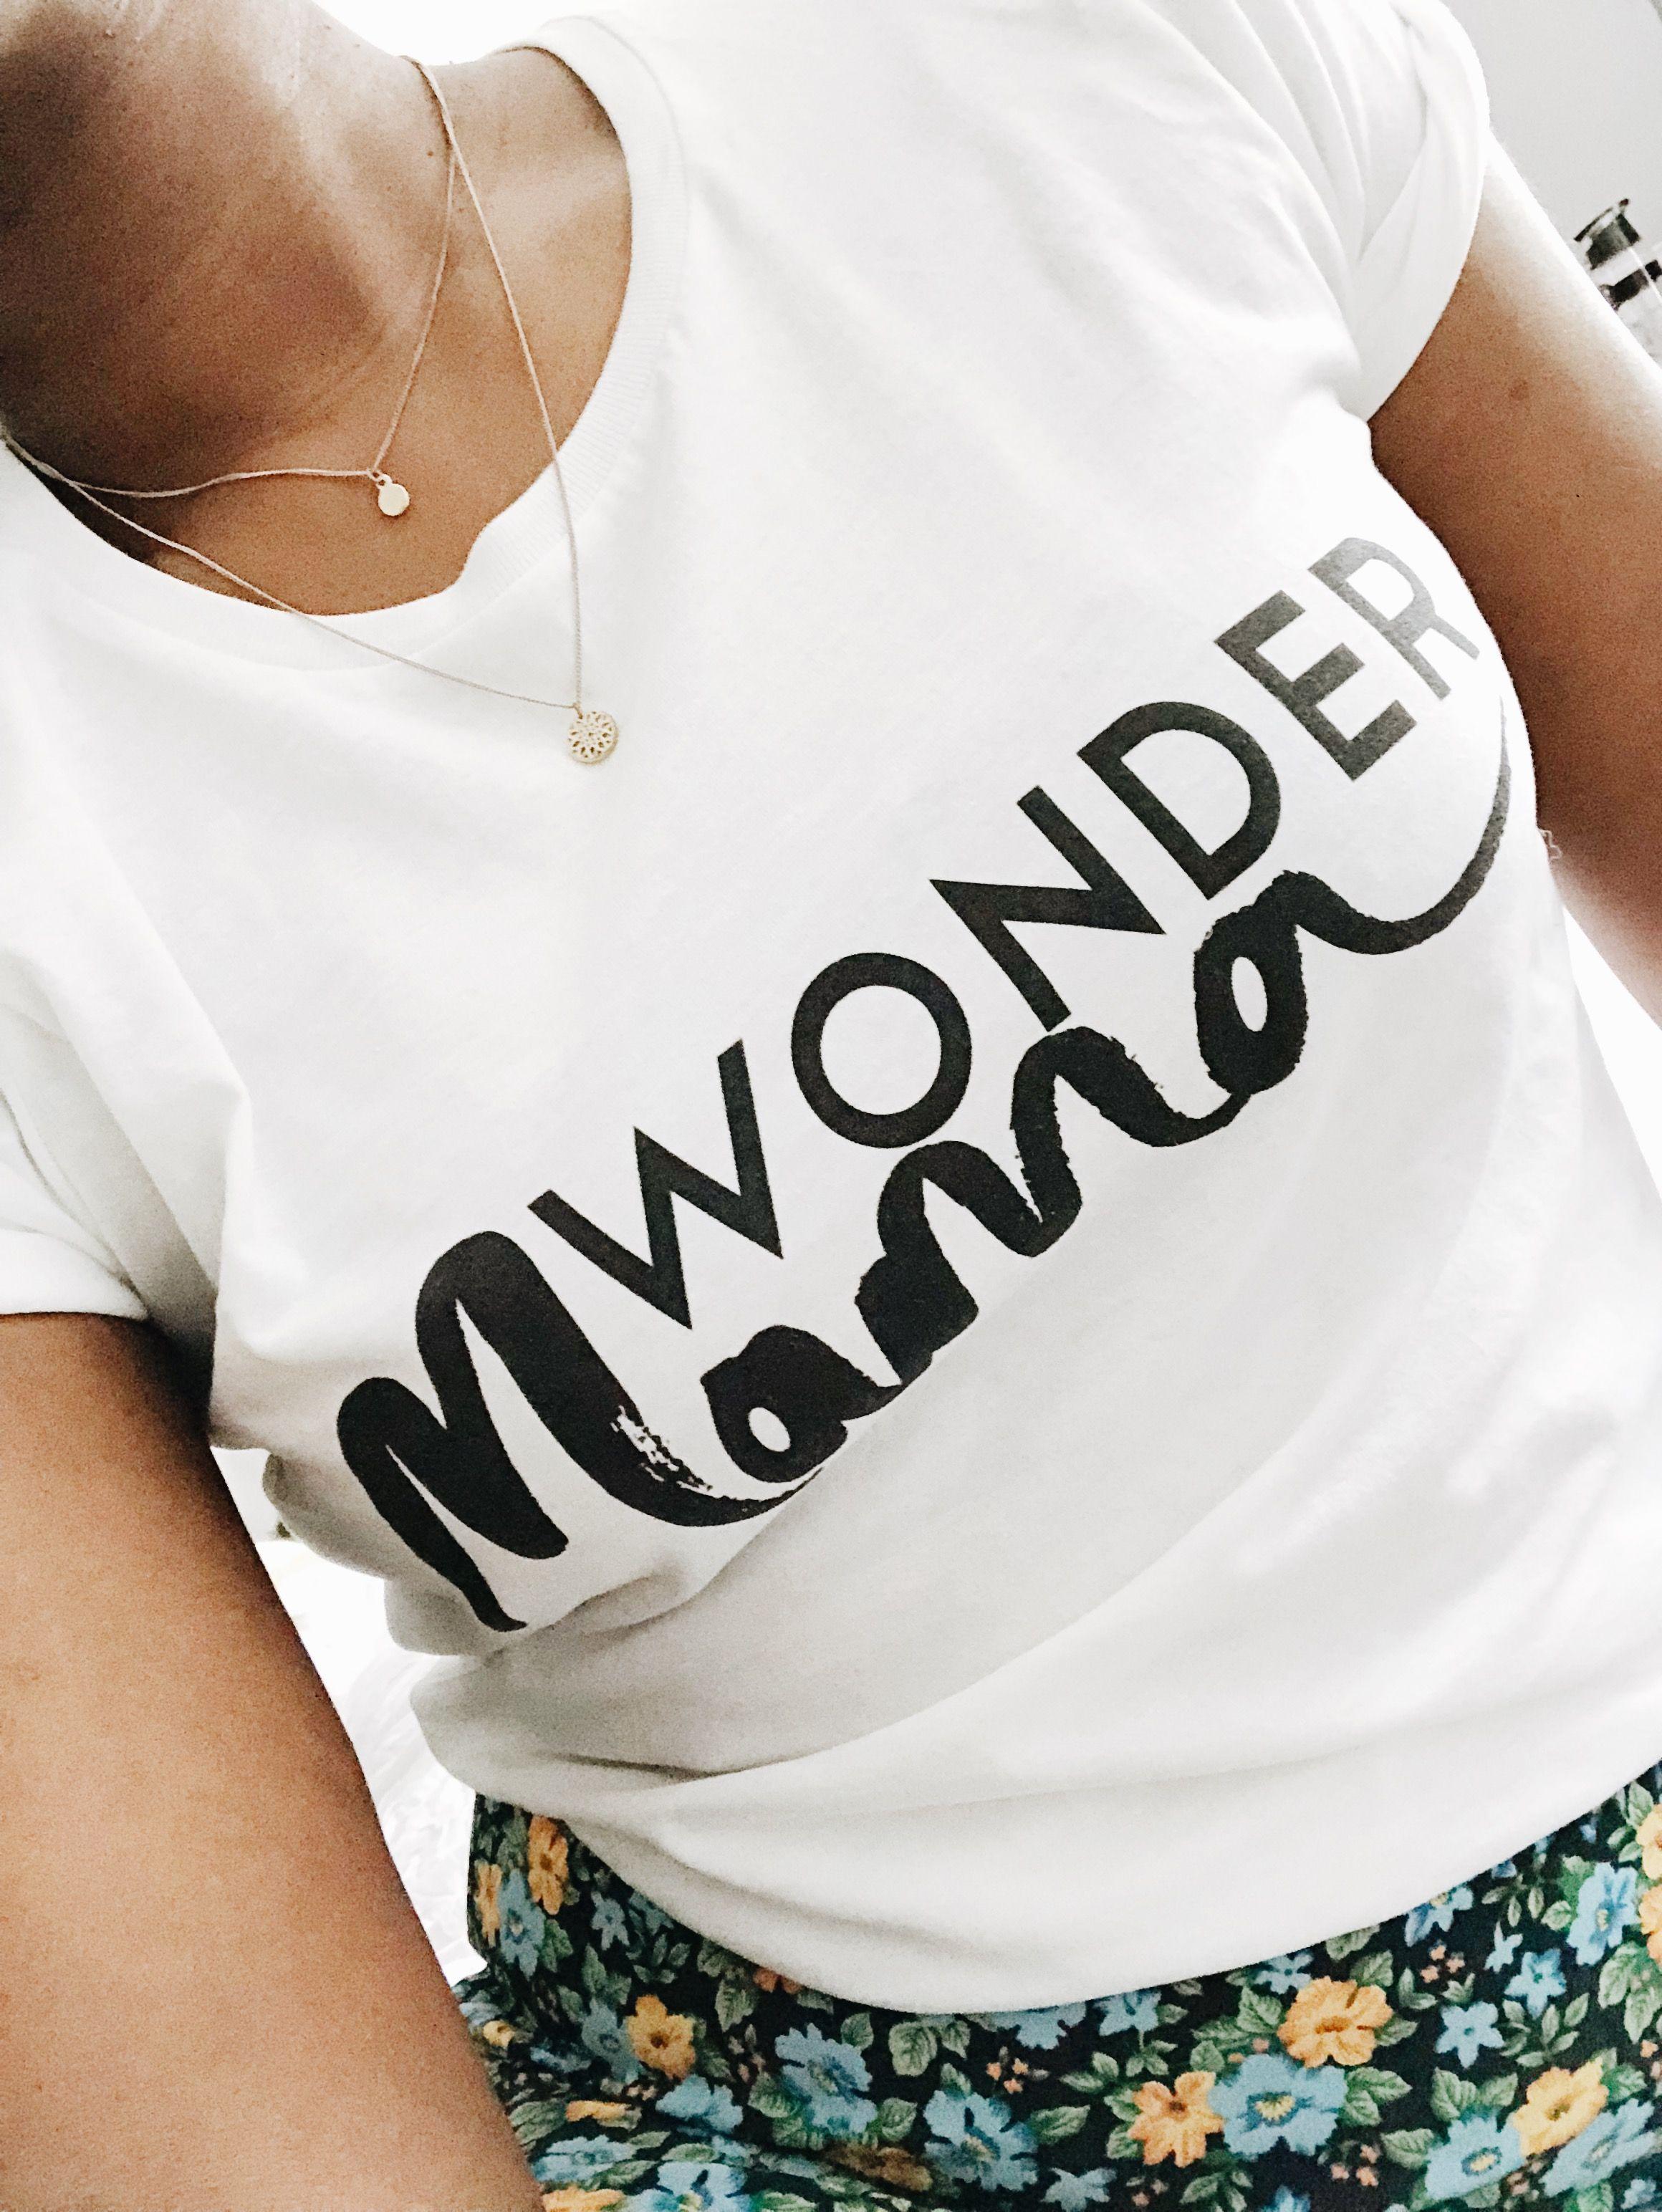 eec6a15531 Wonder Mama t shirt in organic Cotton £23.50 | Wearing Family Merch ...